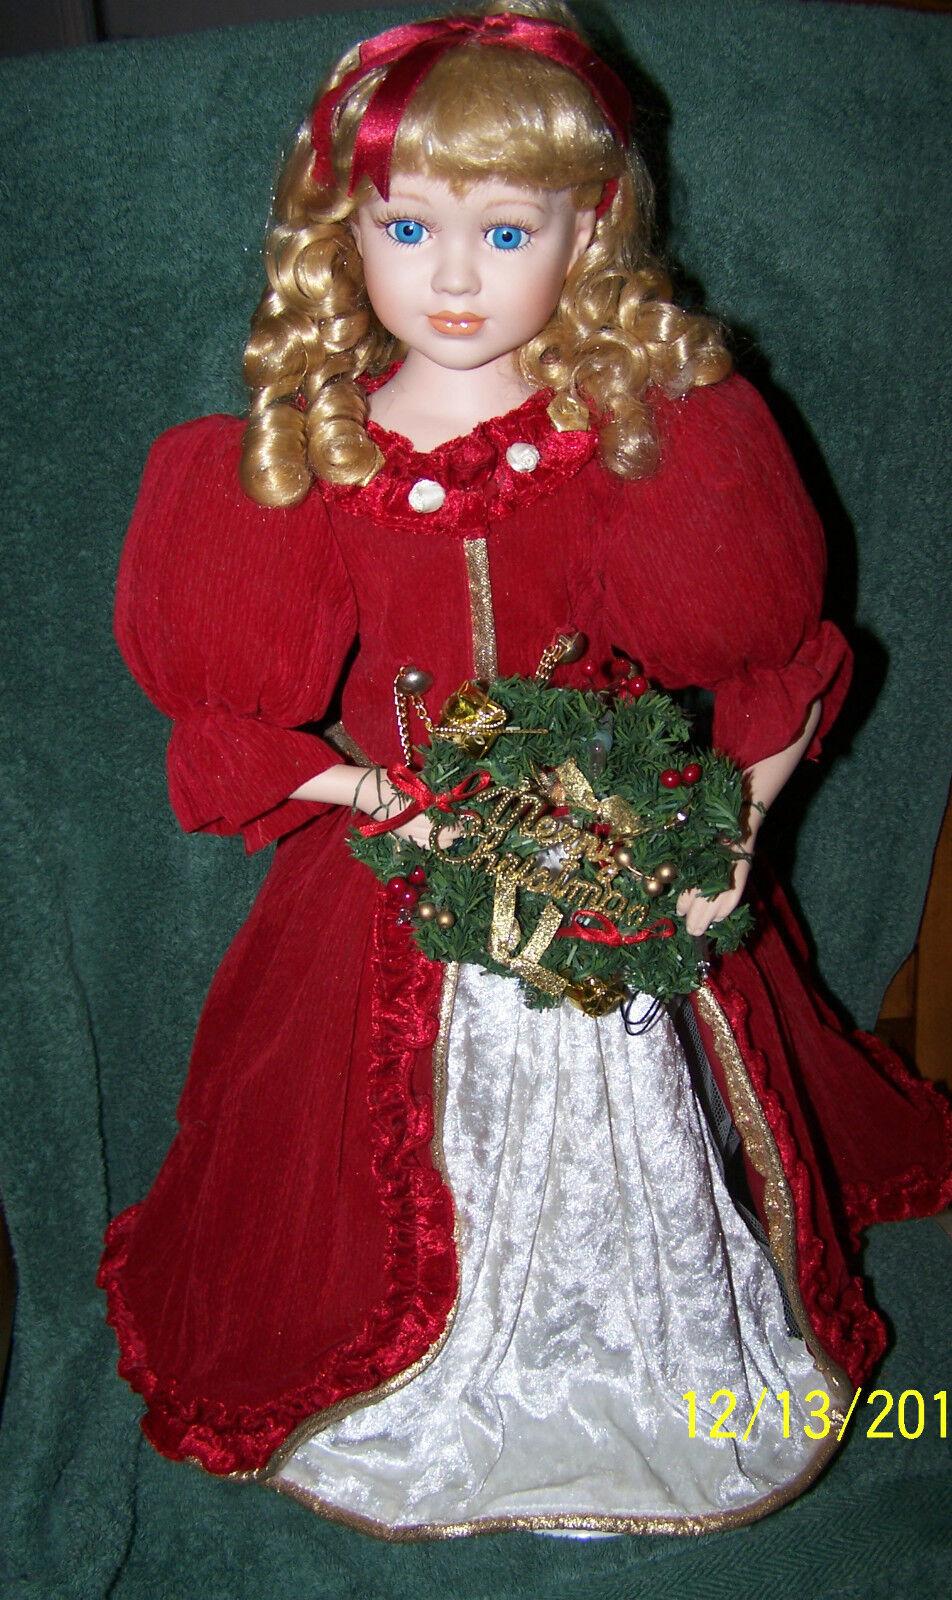 "Gorgeous Blond e blu Eyed  Light Up Merry Christmas bambola, 24"" Ttuttirosso & bianca  vendita calda online"